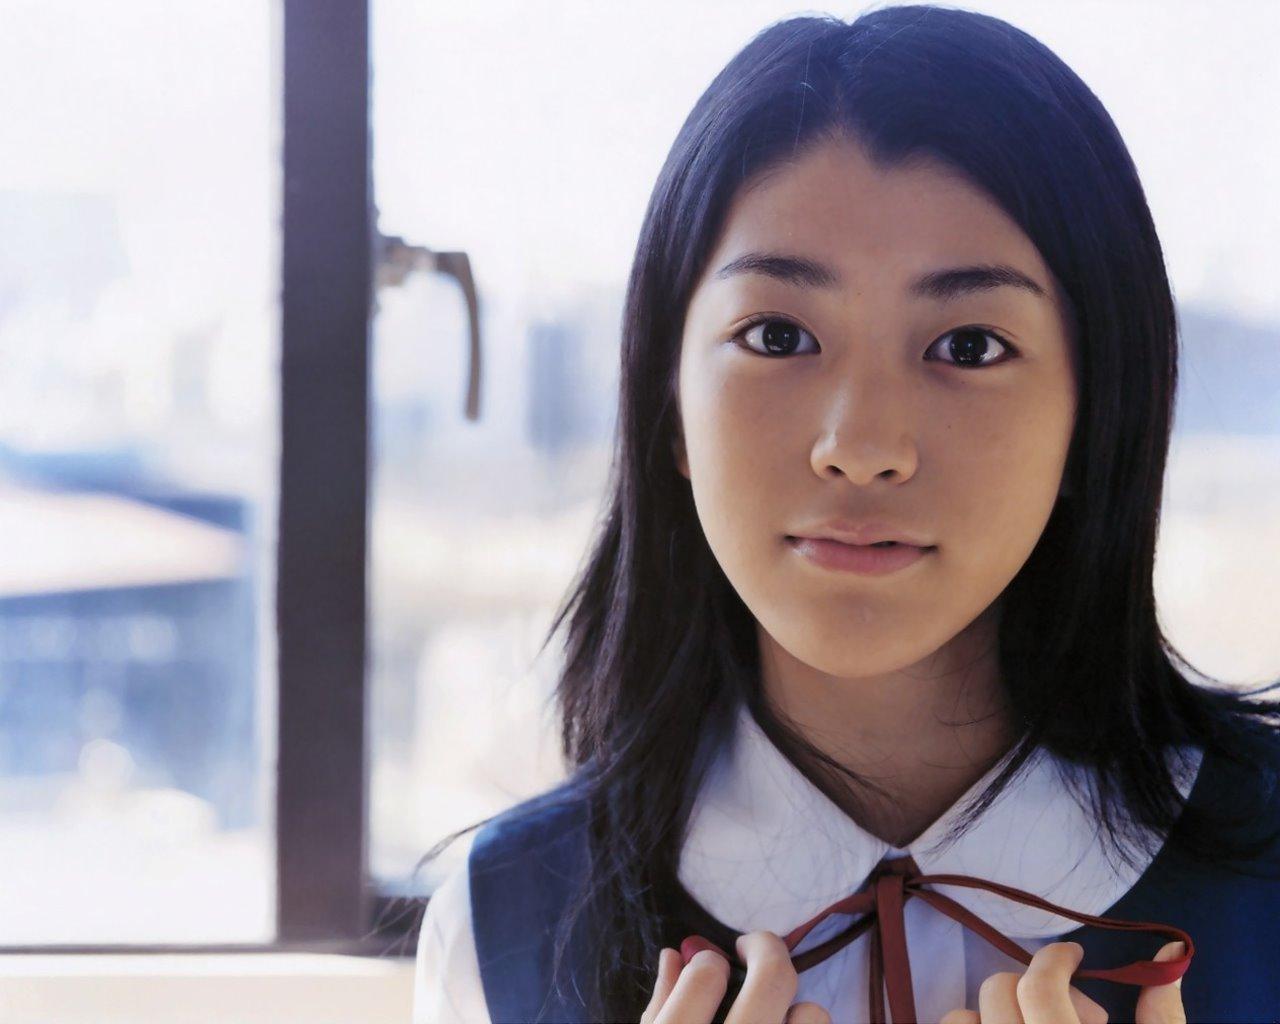 Riko Narumi Poze rezolutie mare Riko Narumi Actor Poza 8 din 15